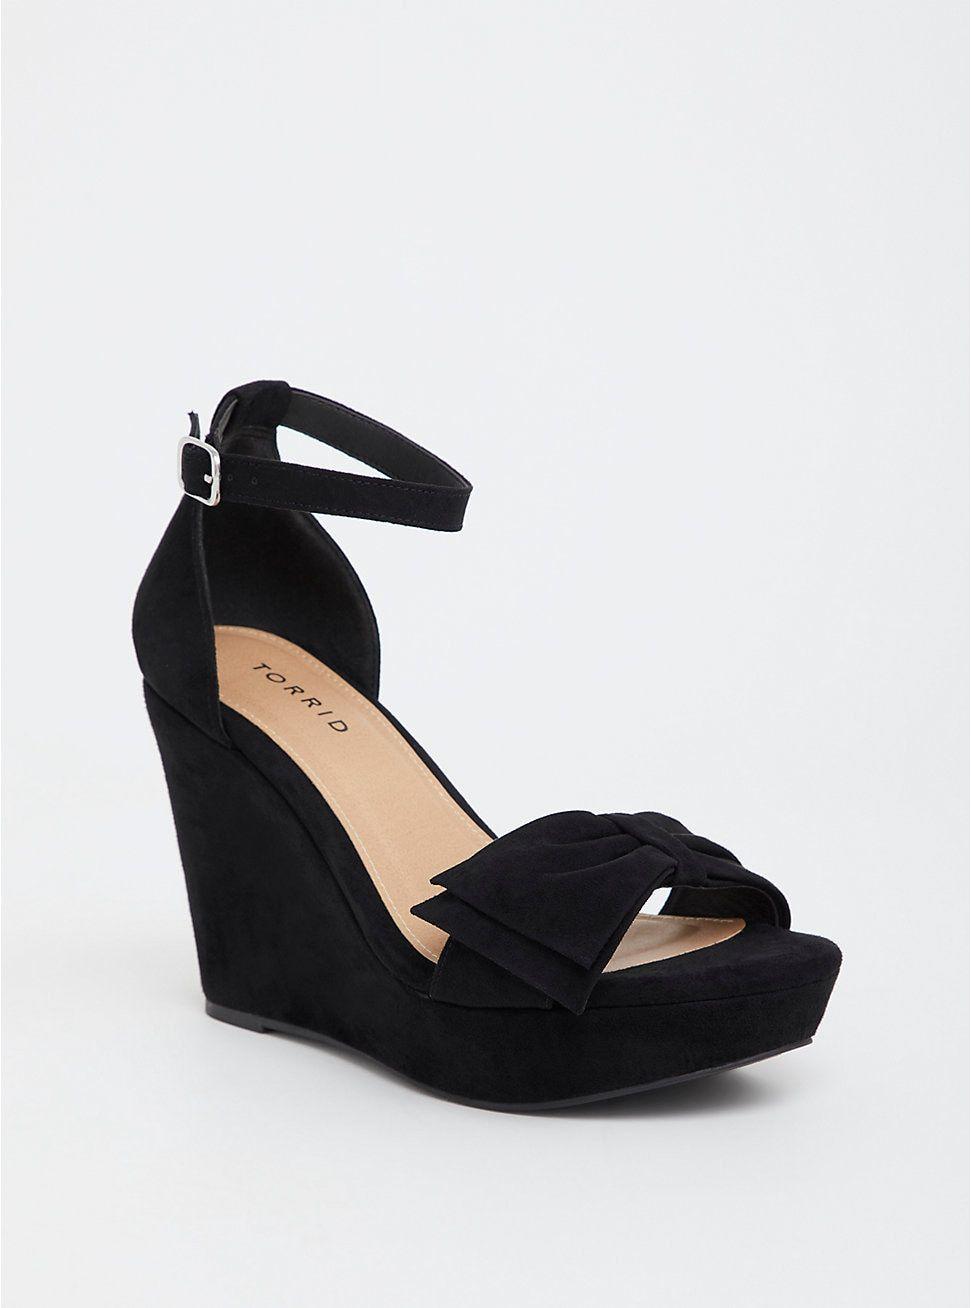 83ea9205987 Plus Size Black Faux Suede Bow Wedge Sandal (Wide Width)